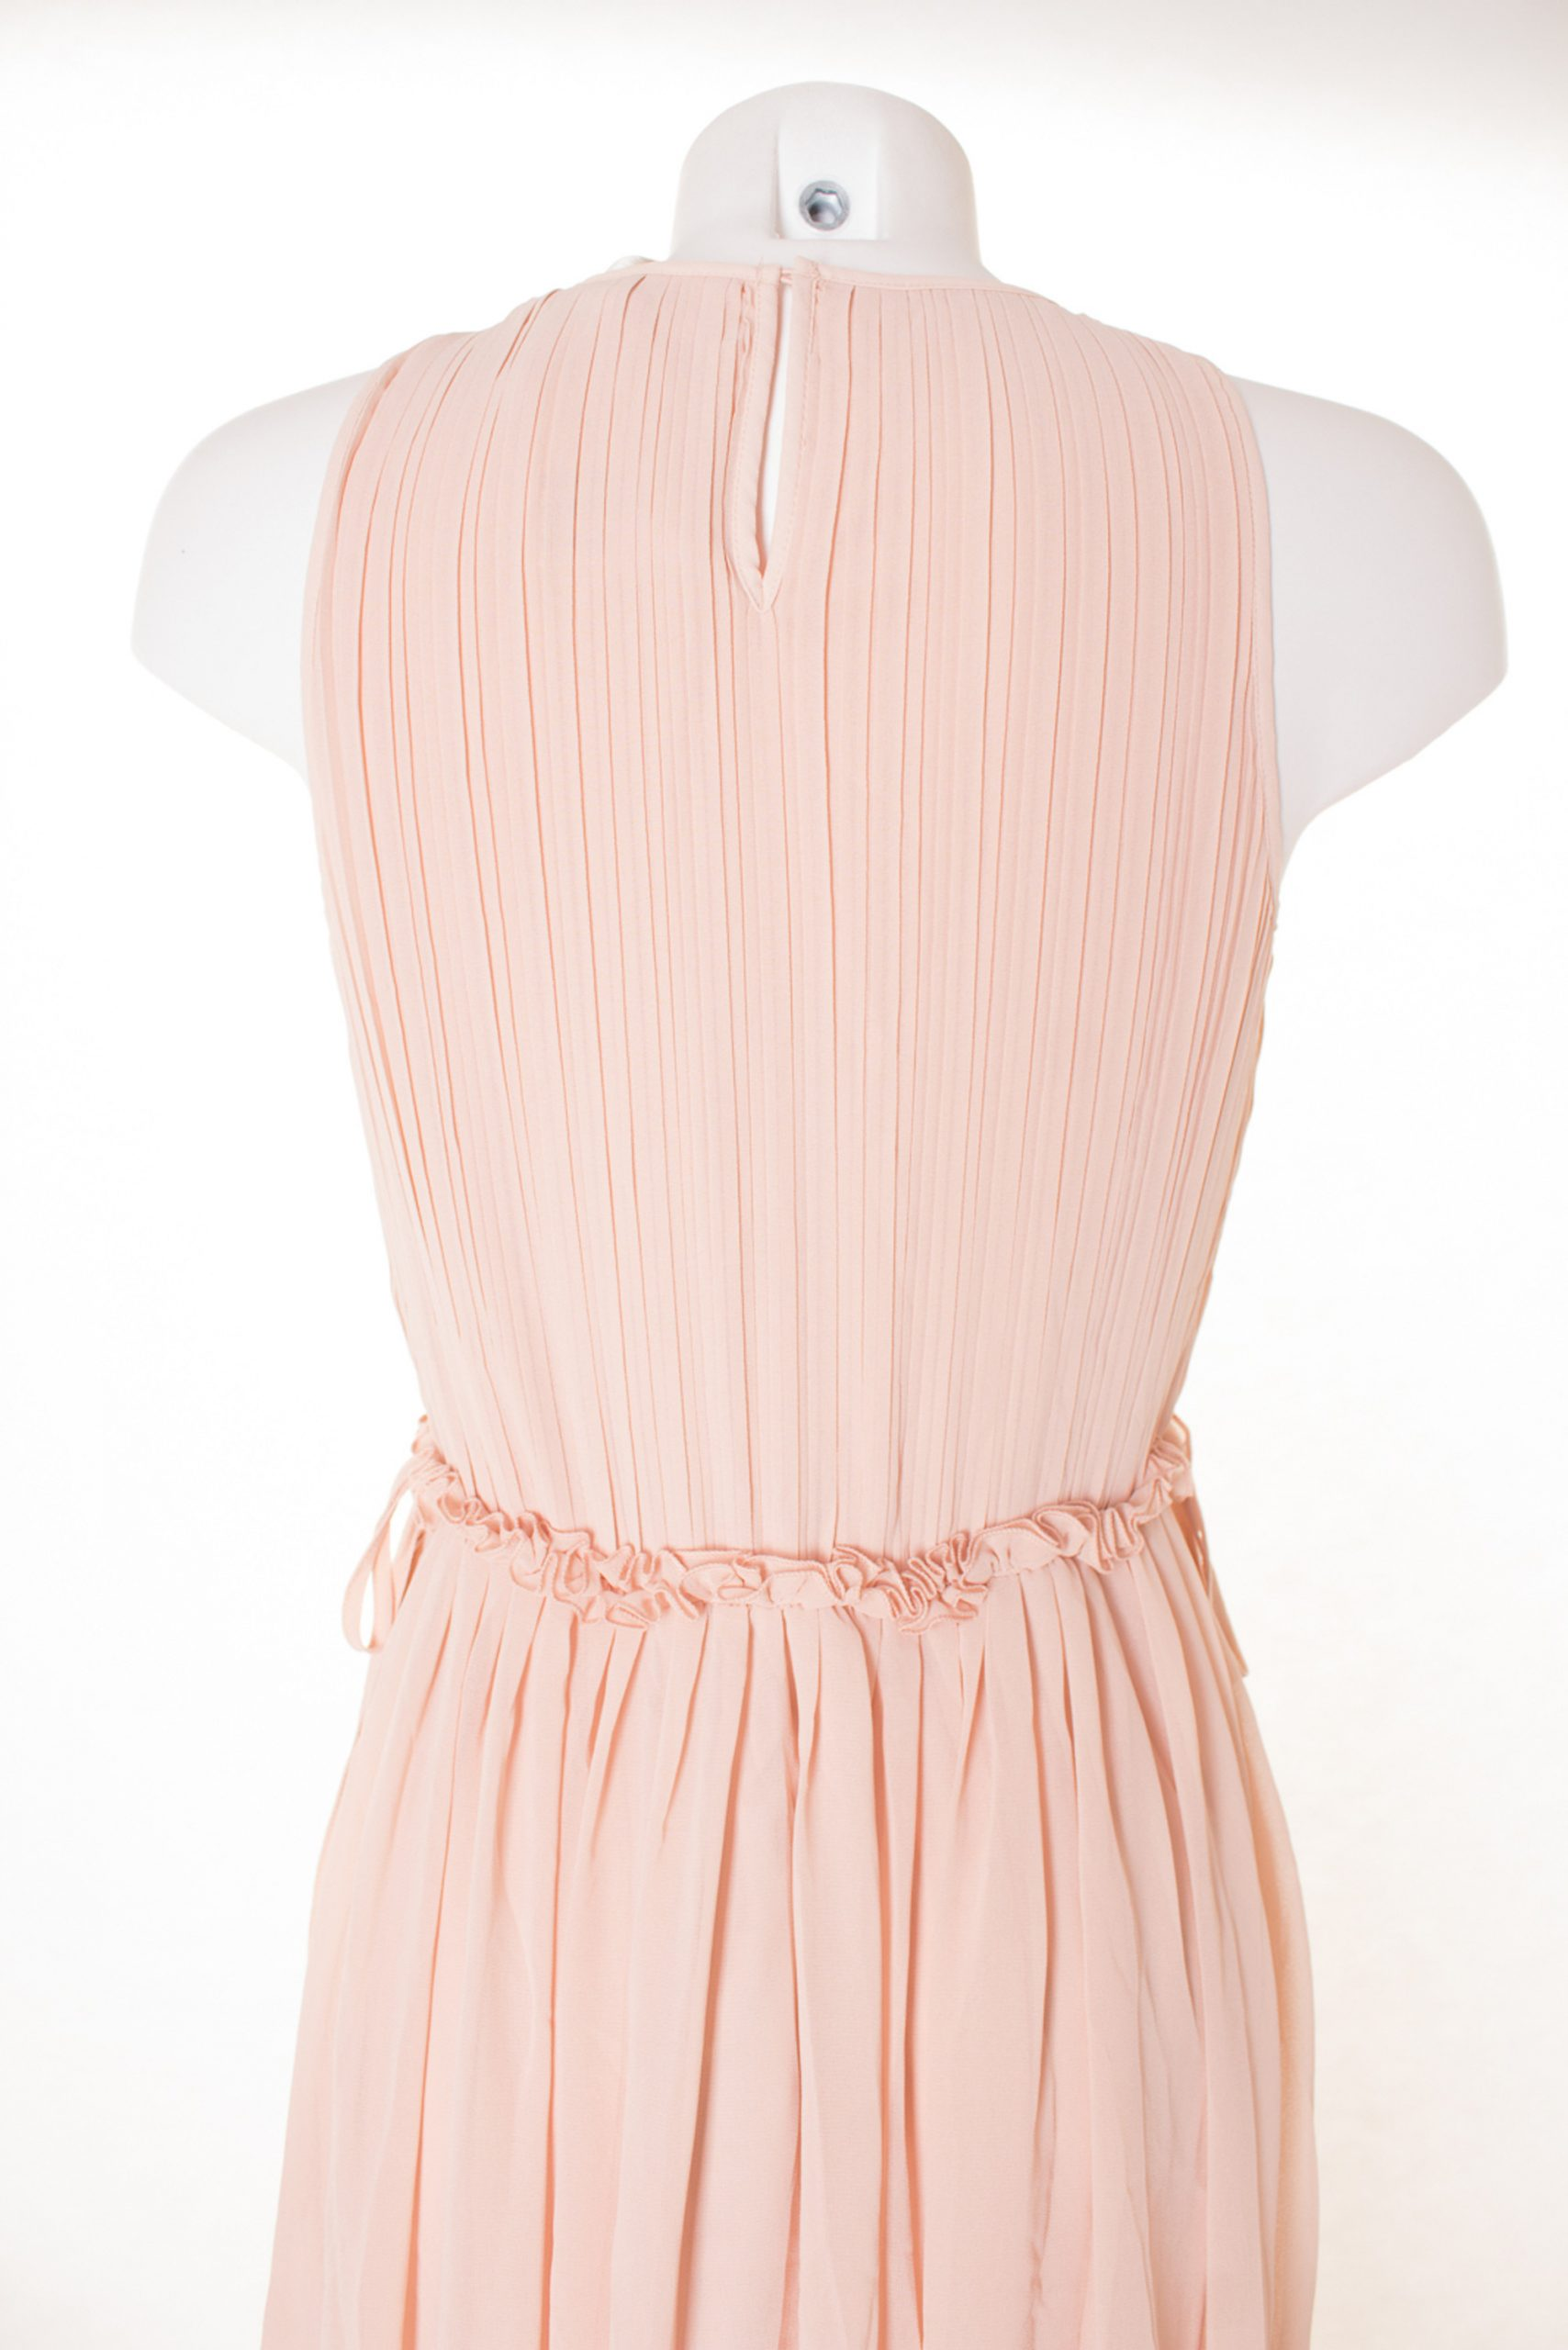 Hm Kleid Dress Robe Maxikleid Damen Gr De 40 In Rosa Neu